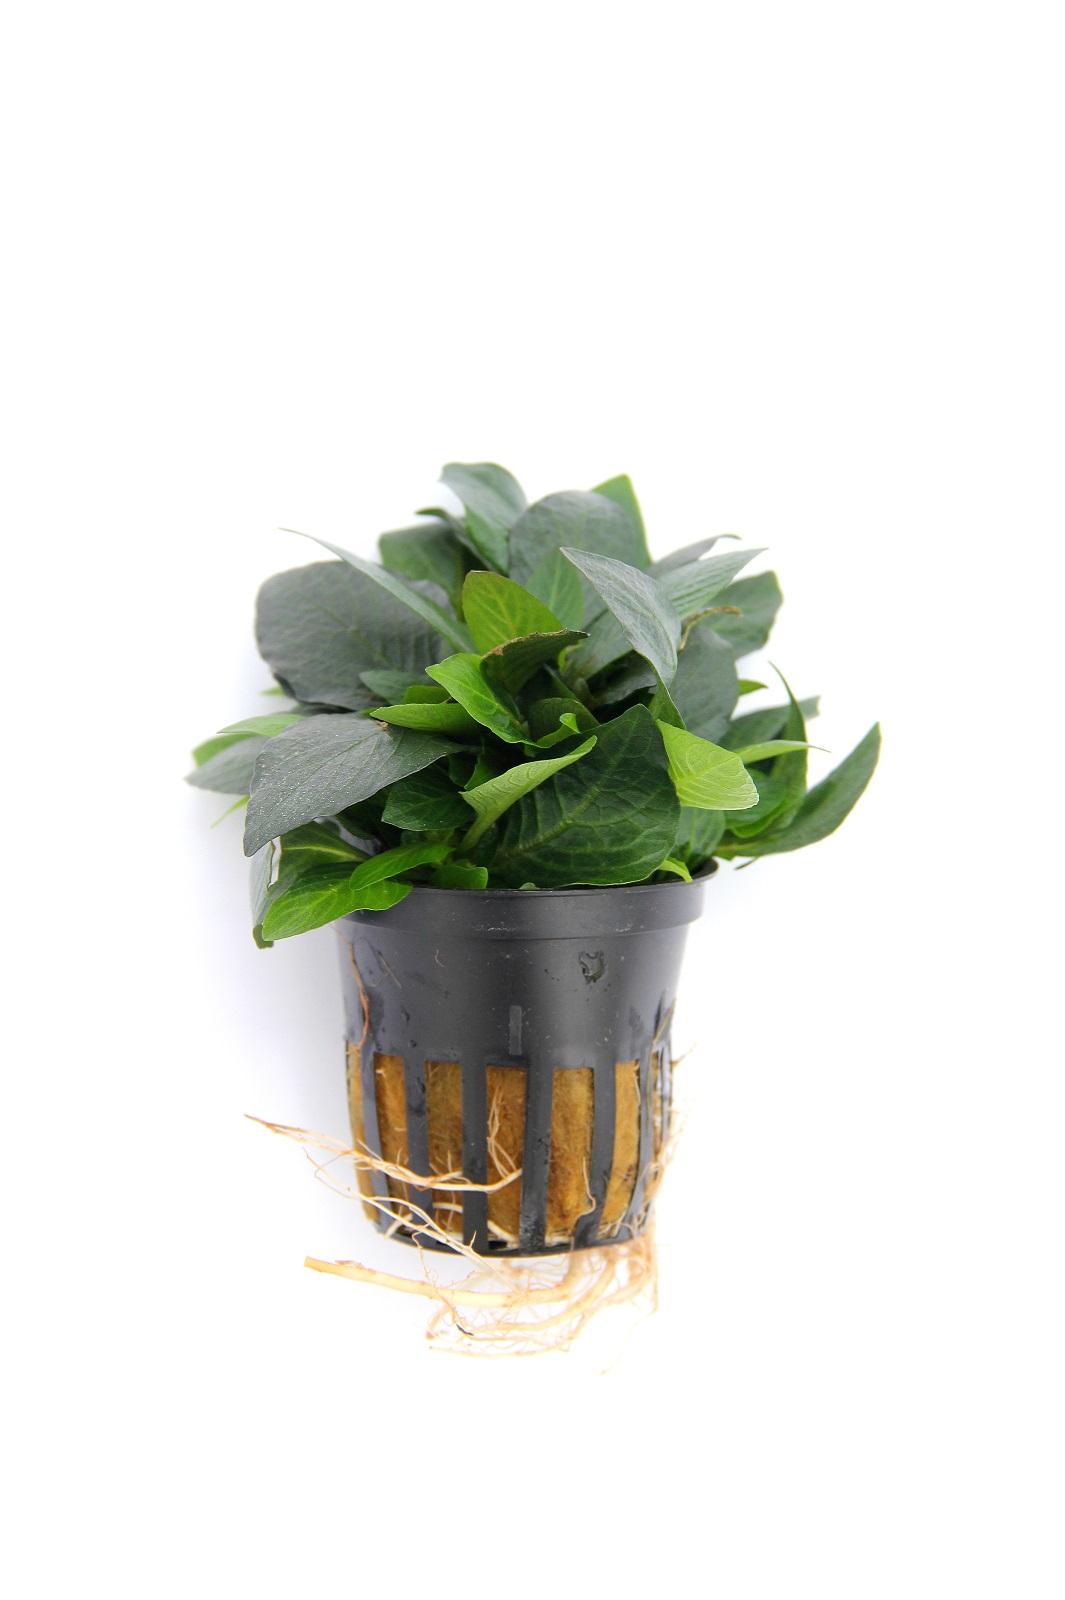 Hygrophila corymbosa Kompakt Wasserpflanze Aquarium